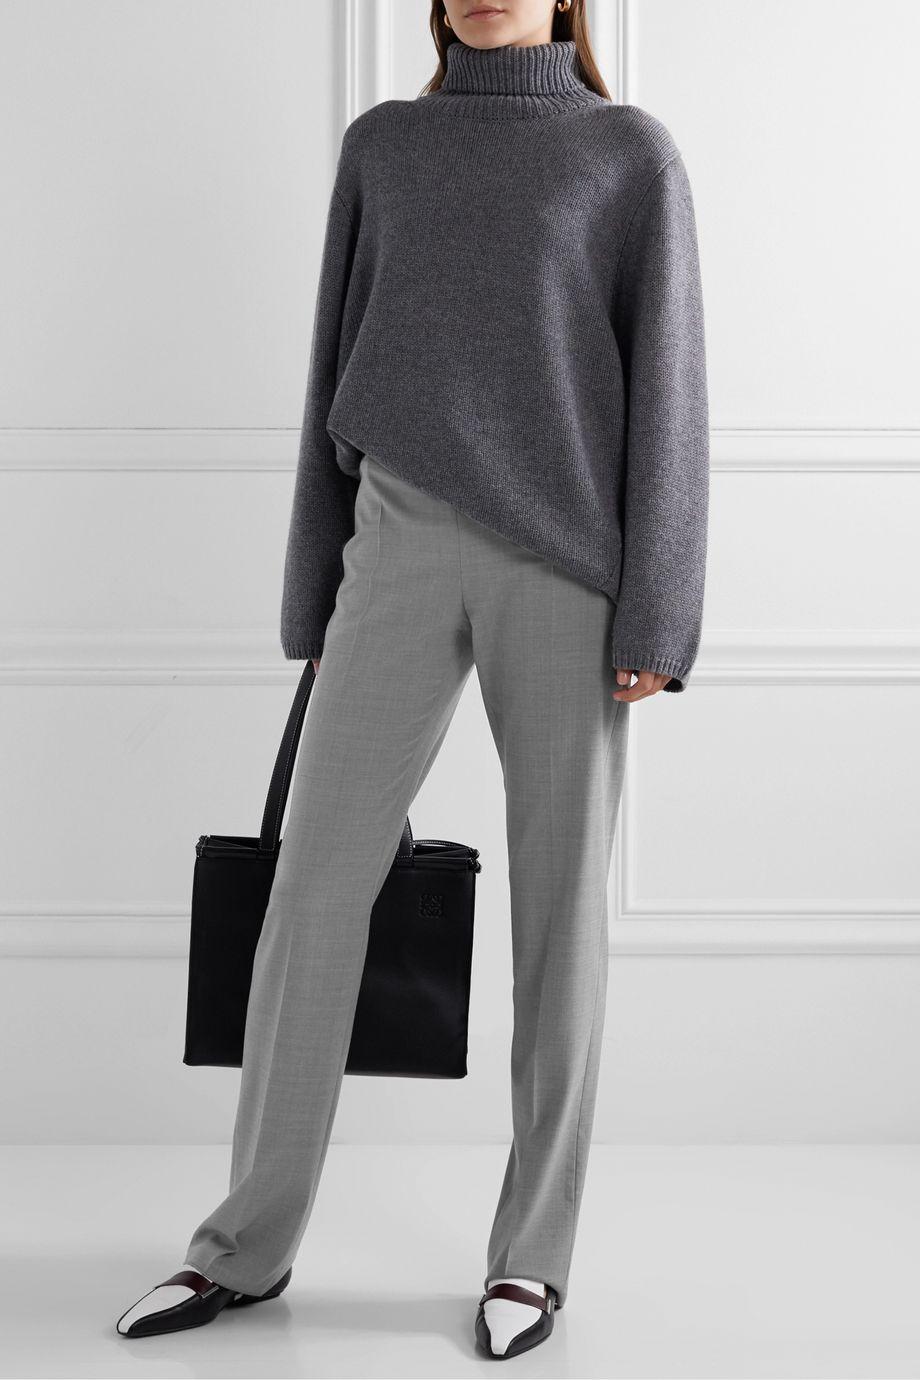 Max Mara Edison wool straight-leg pants